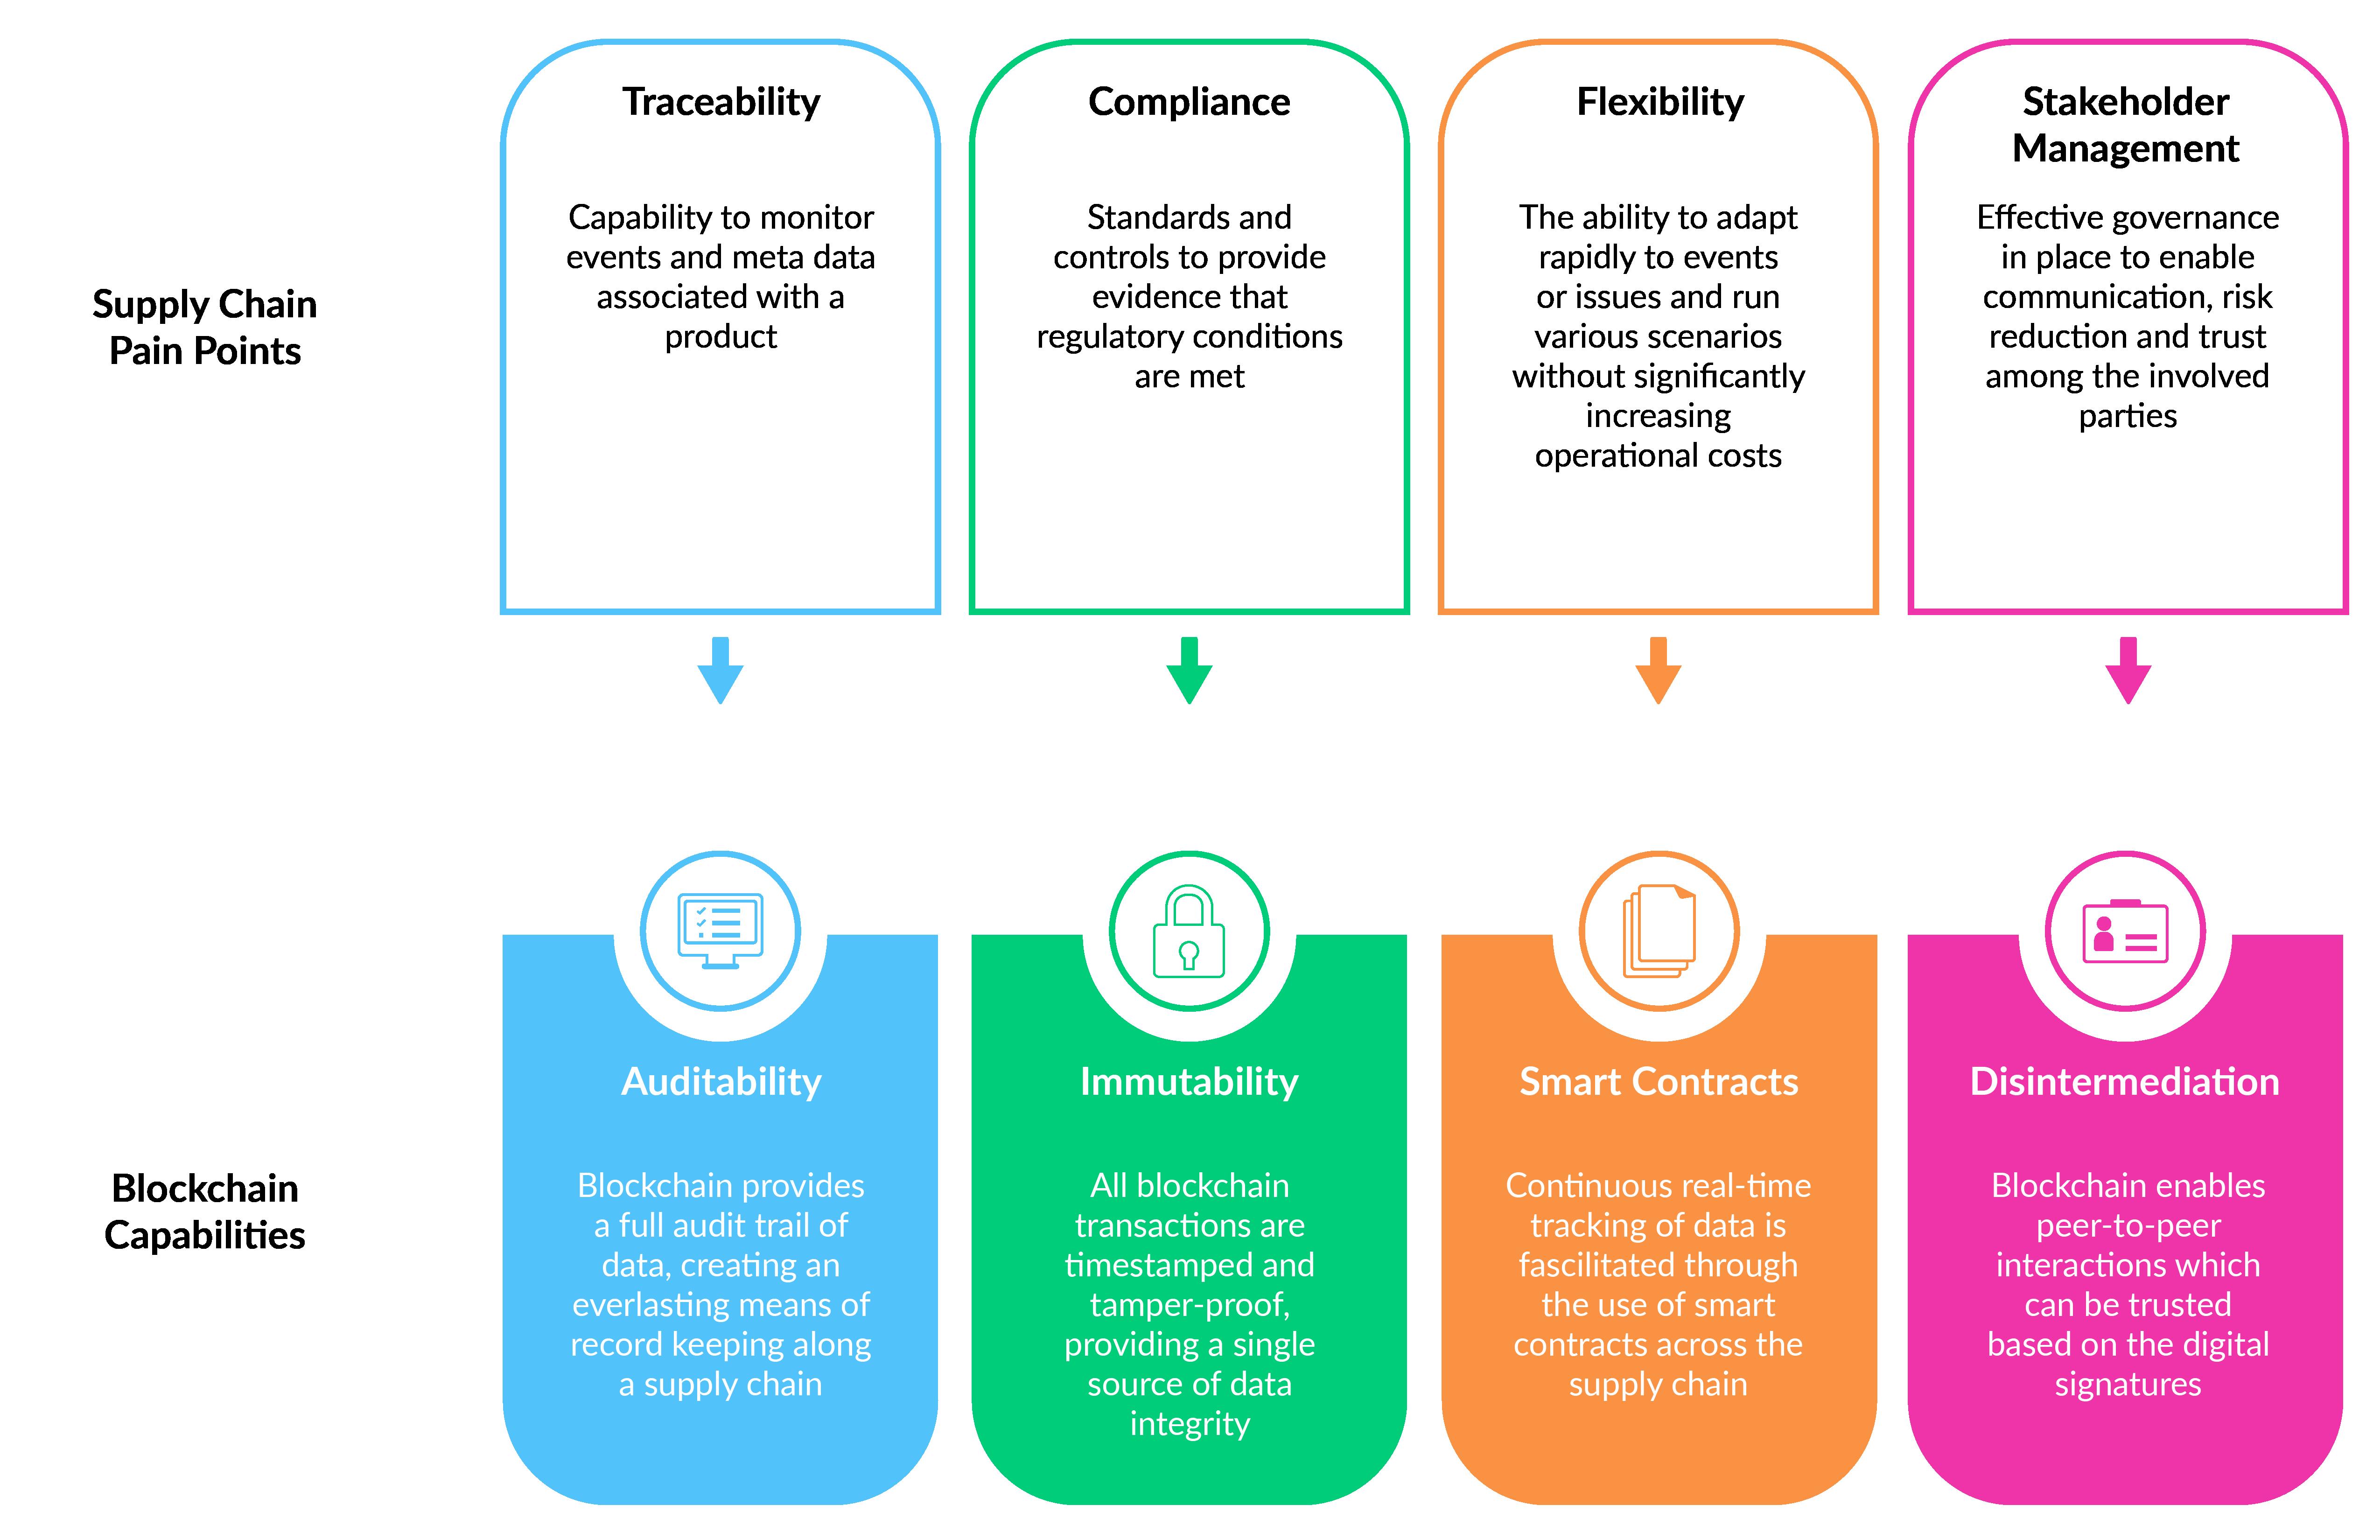 Blockchain capabilities